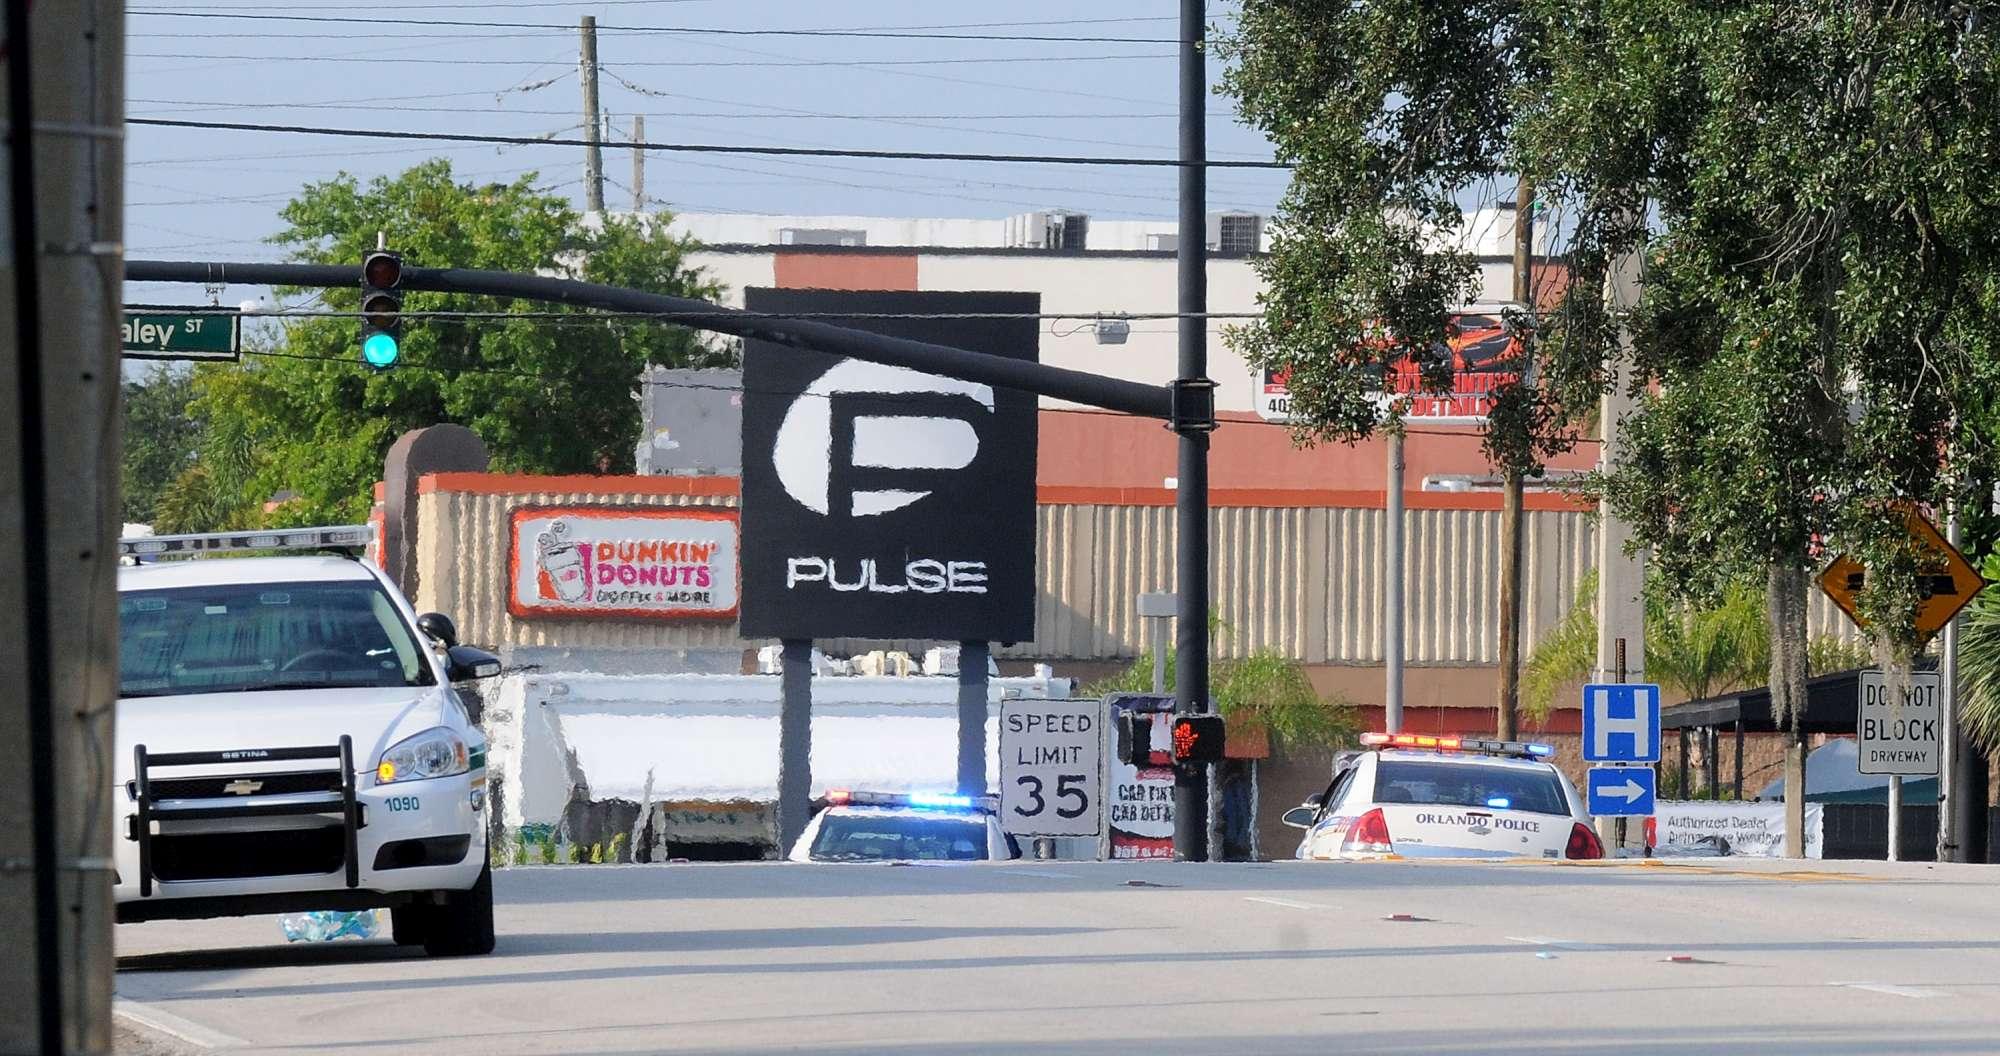 Usa, sparatoria in un night club gay: è strage